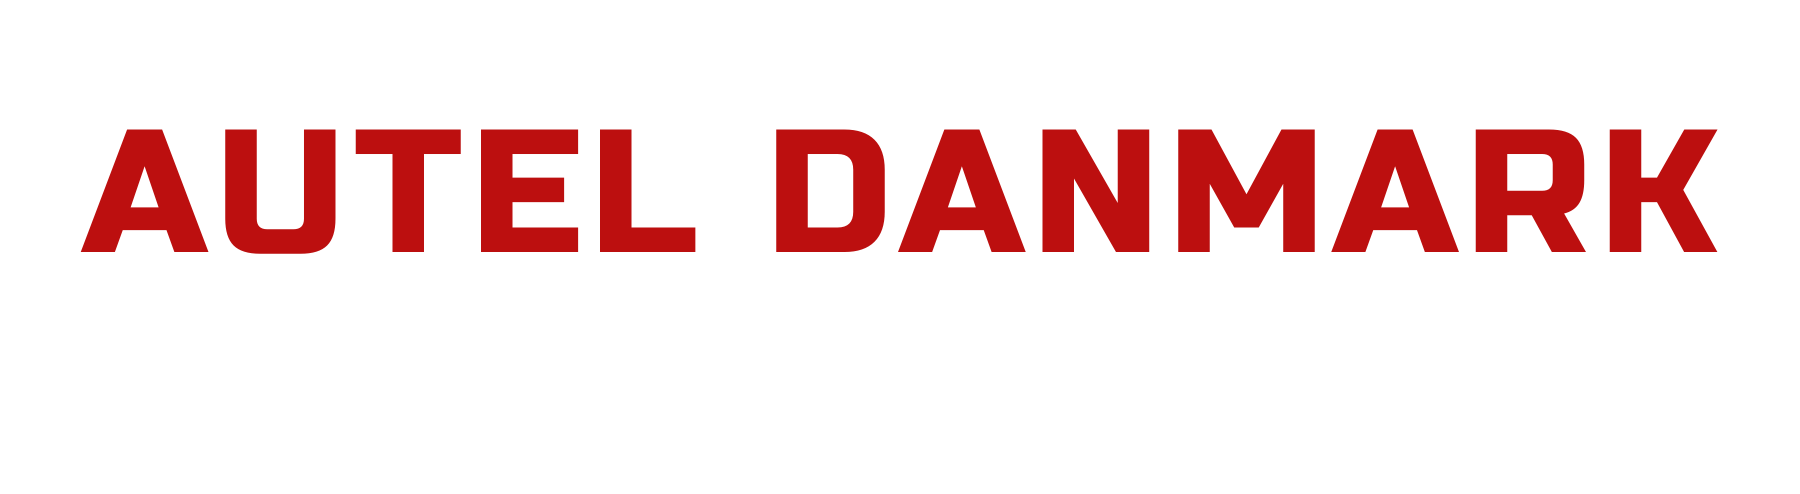 Autel Danmark